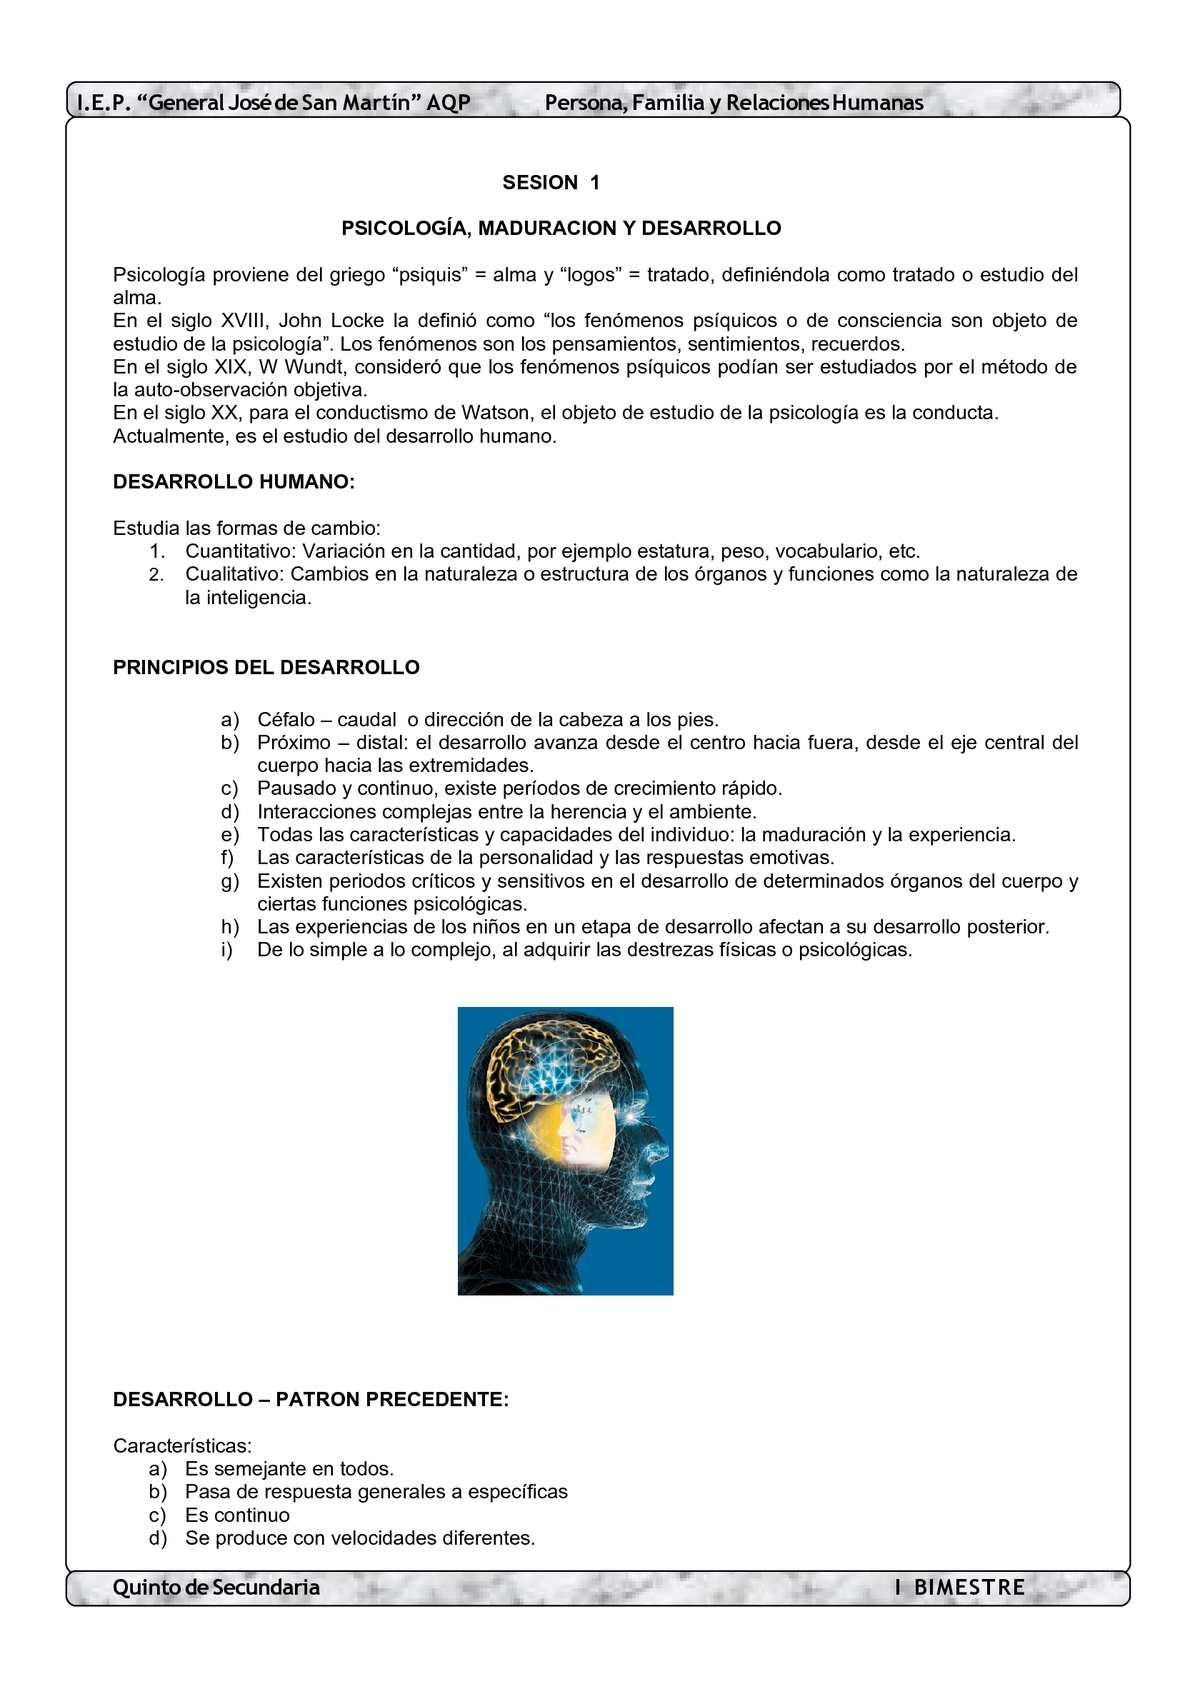 LIBRO 5TO PFRH - I BIM